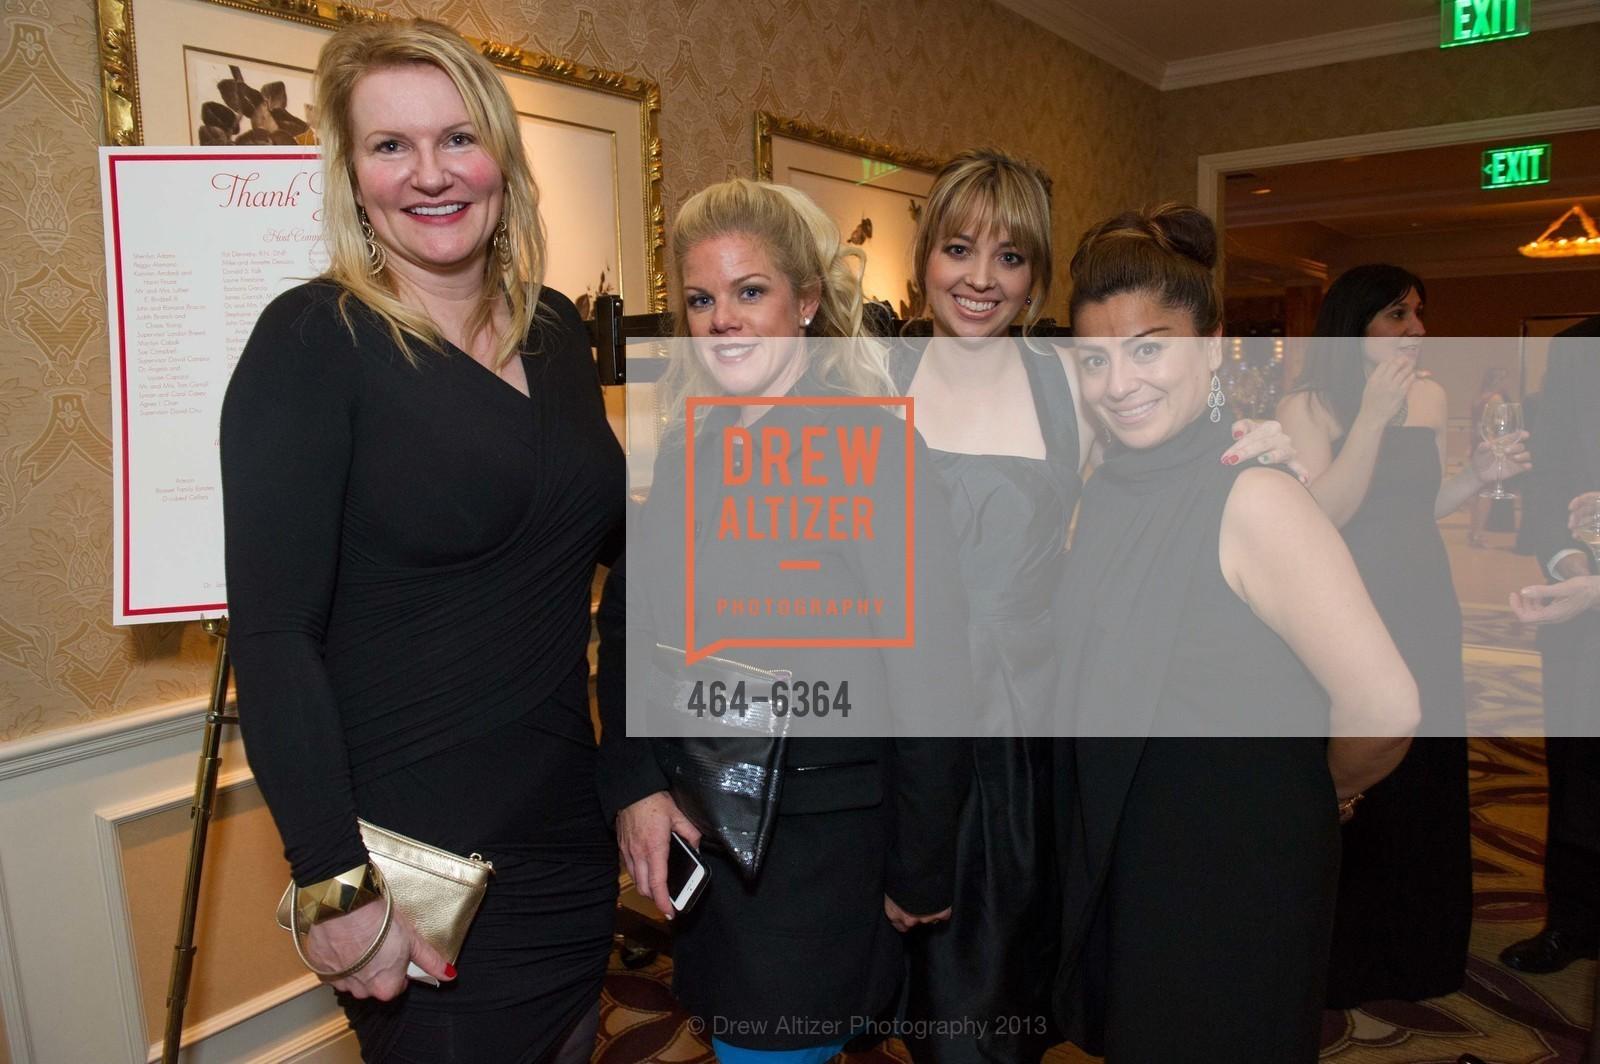 Suzanne Pardino, Theresa Edison, Megan White, Maggie Morillo, 25th Anniversary Holiday HOB NOB ON THE HILL, US, December 6th, 2013